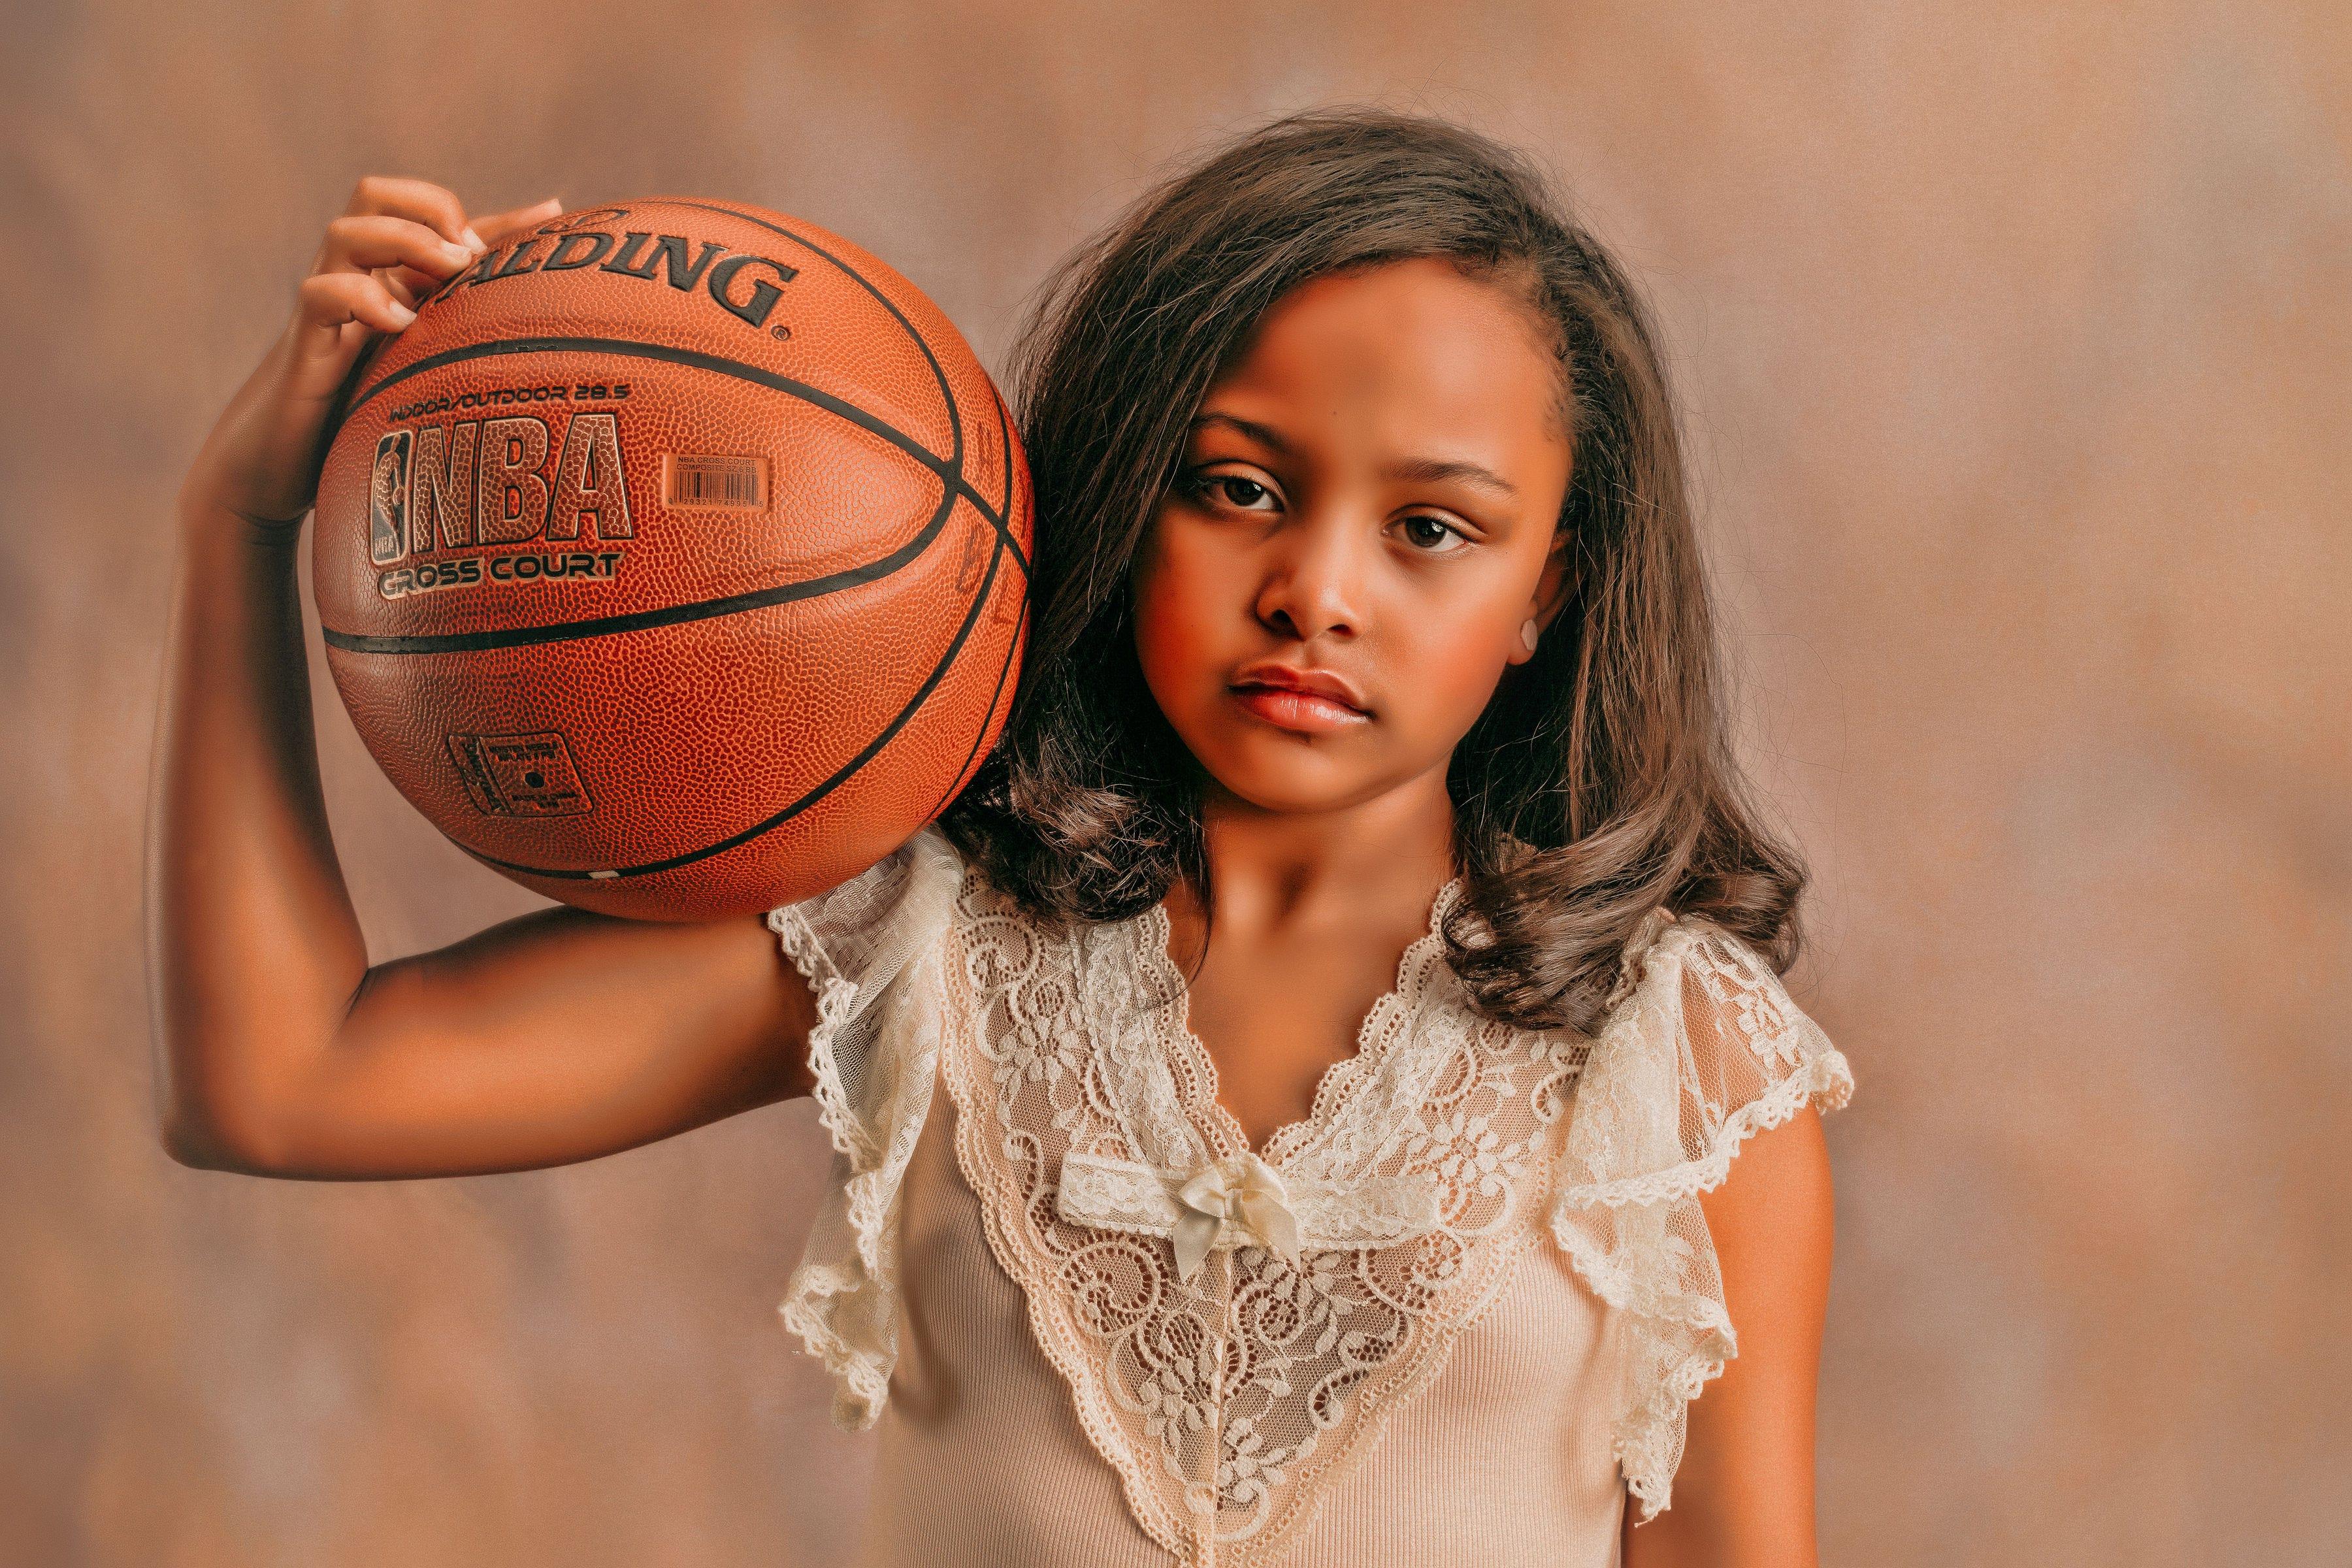 Mom Creates Viral Photo Series Of Girls As Athletes And Princesses